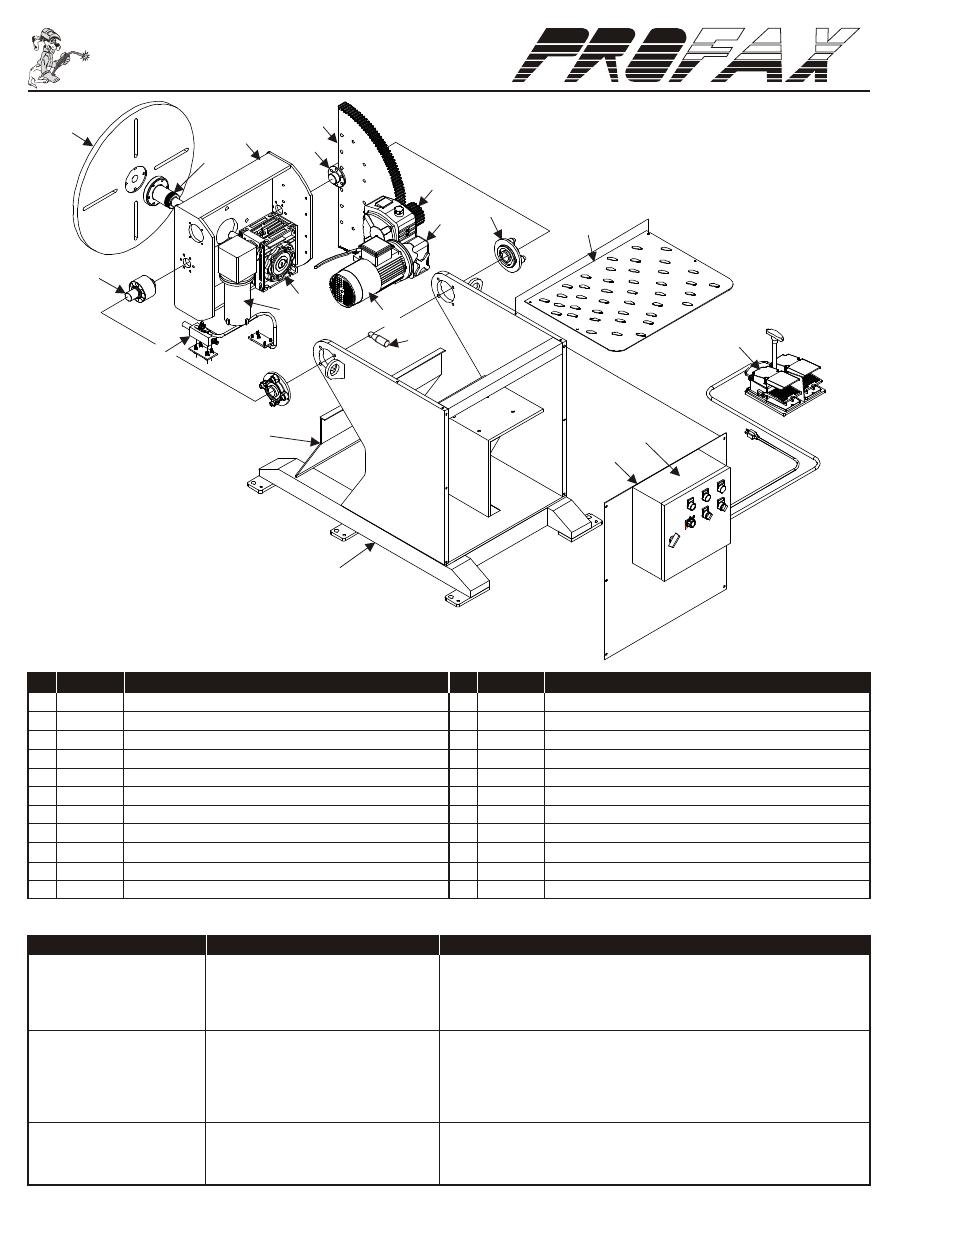 doc006 wp 500 parts list, daily maintenance profax wp 500 user manual